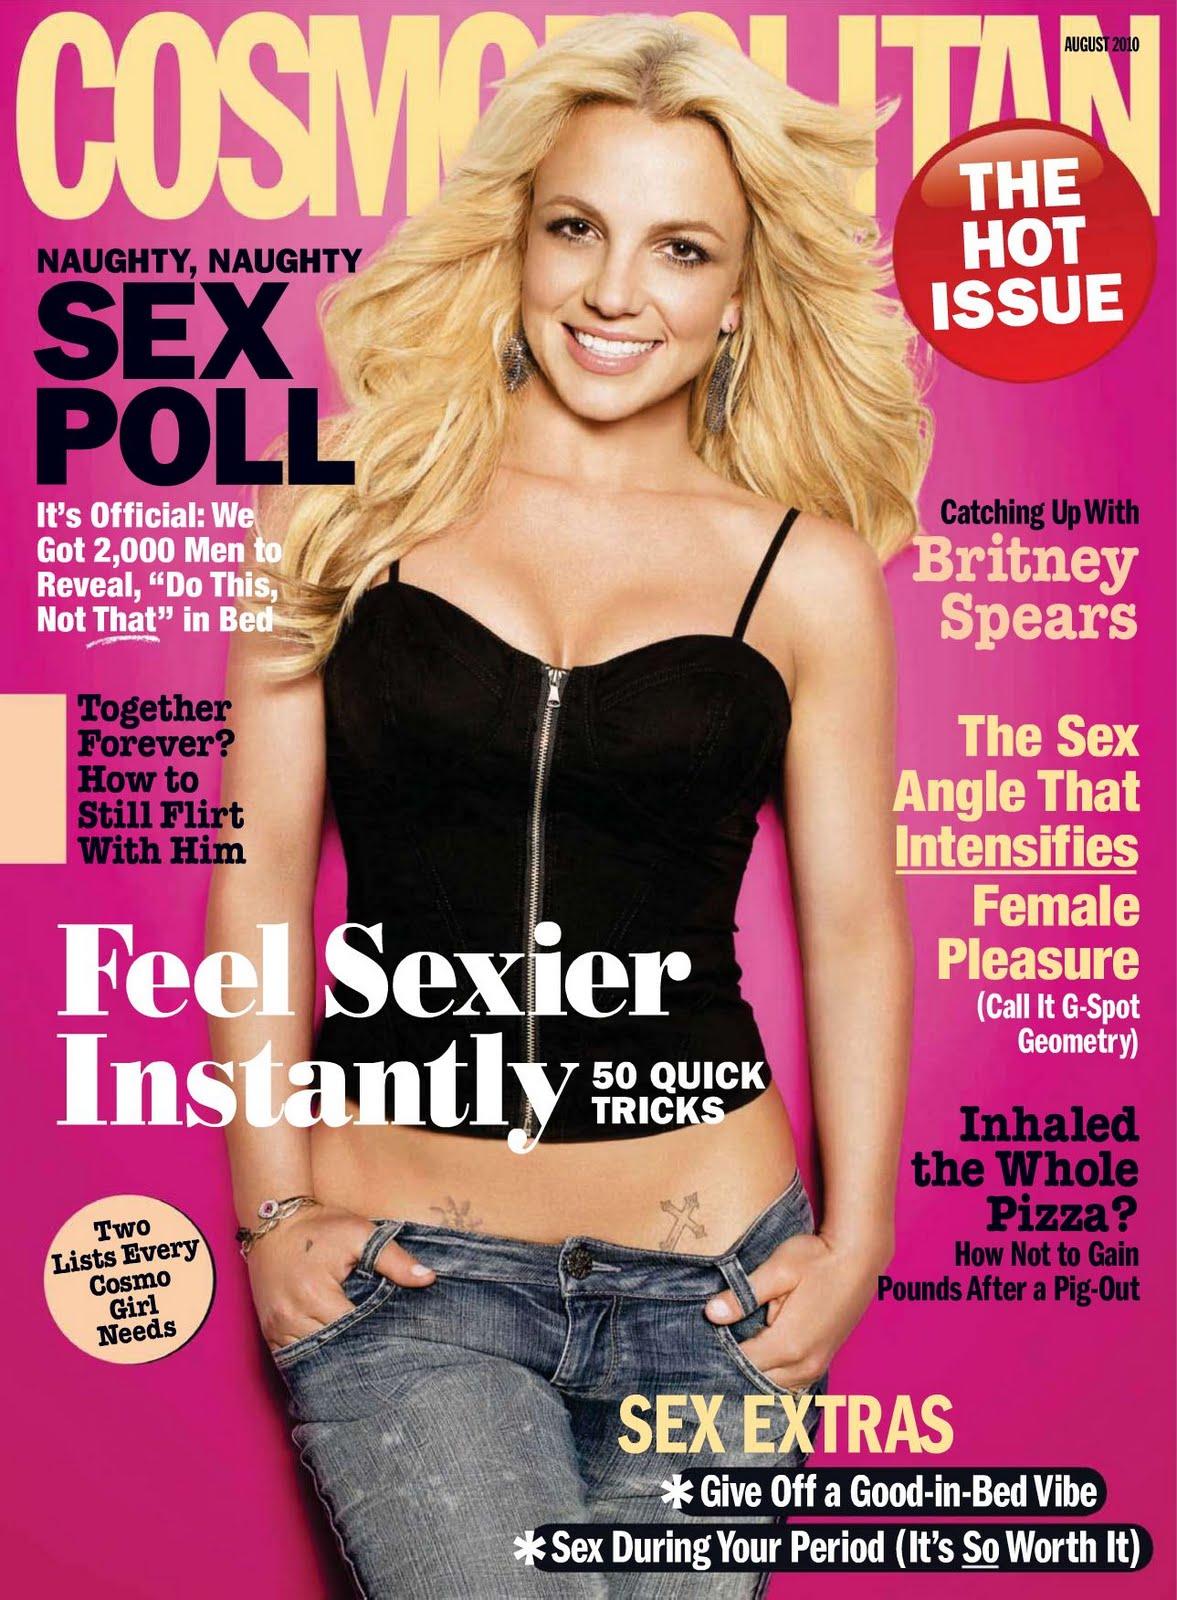 http://1.bp.blogspot.com/_mKeaqyocUS0/TEnPfCJRUDI/AAAAAAAABv0/FeYyof7-ELY/s1600/59216_septimiu29_BritneySpears_Cosmopolitan_August20101_122_102lo.jpg